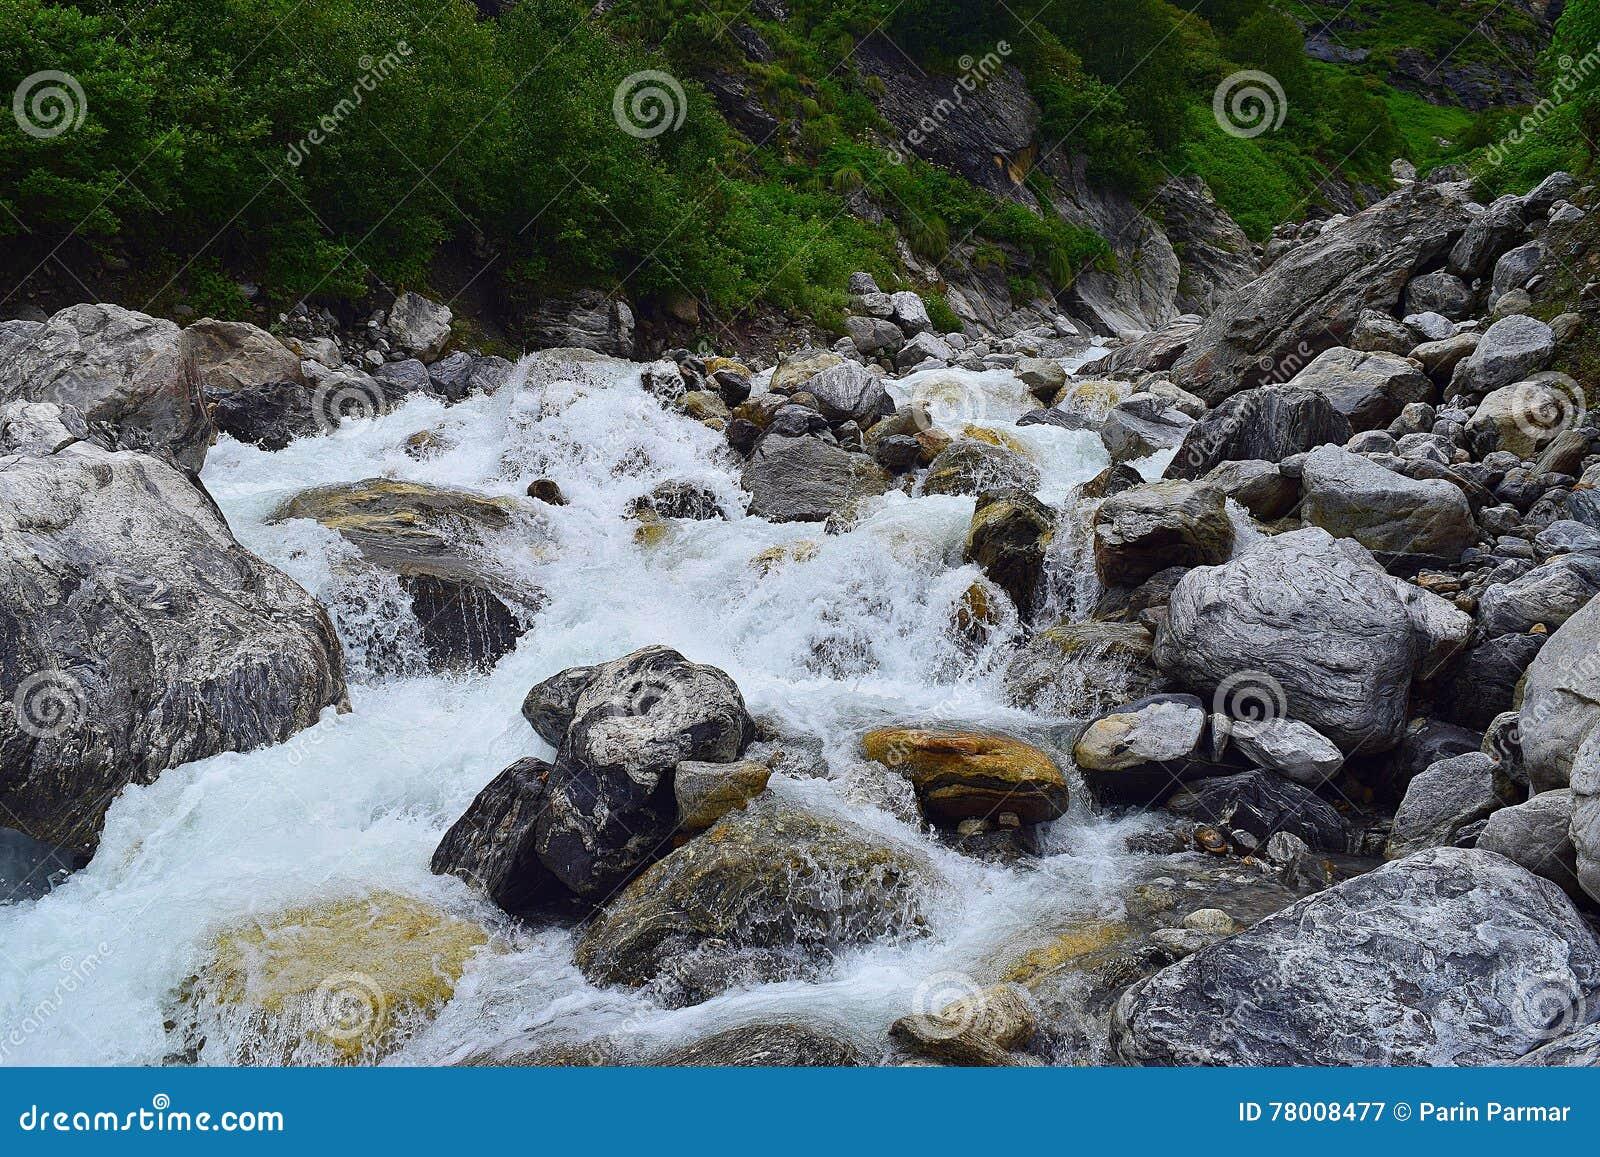 Río Pushpavati que fluye junto con viaje al valle de flores, Uttarakhand, la India